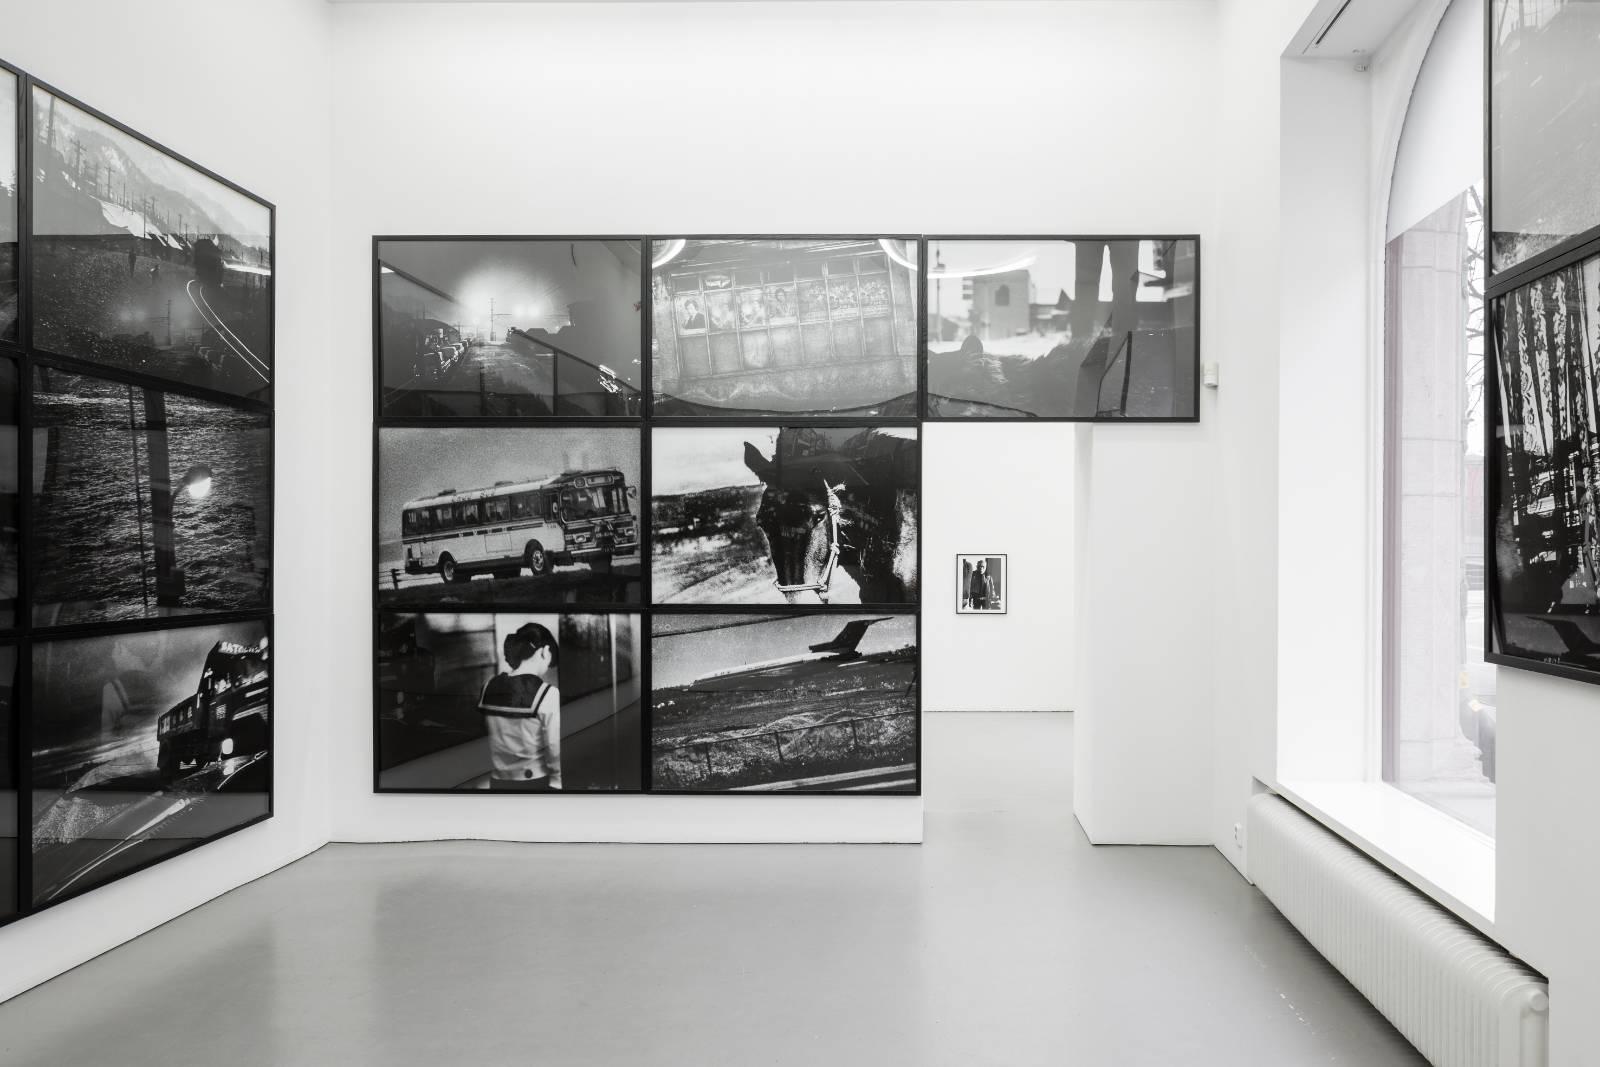 Installation view, Daido Moriyama, Hokkaido / The World Through My Eyes, Gallery Riis, Stockholm, 2013